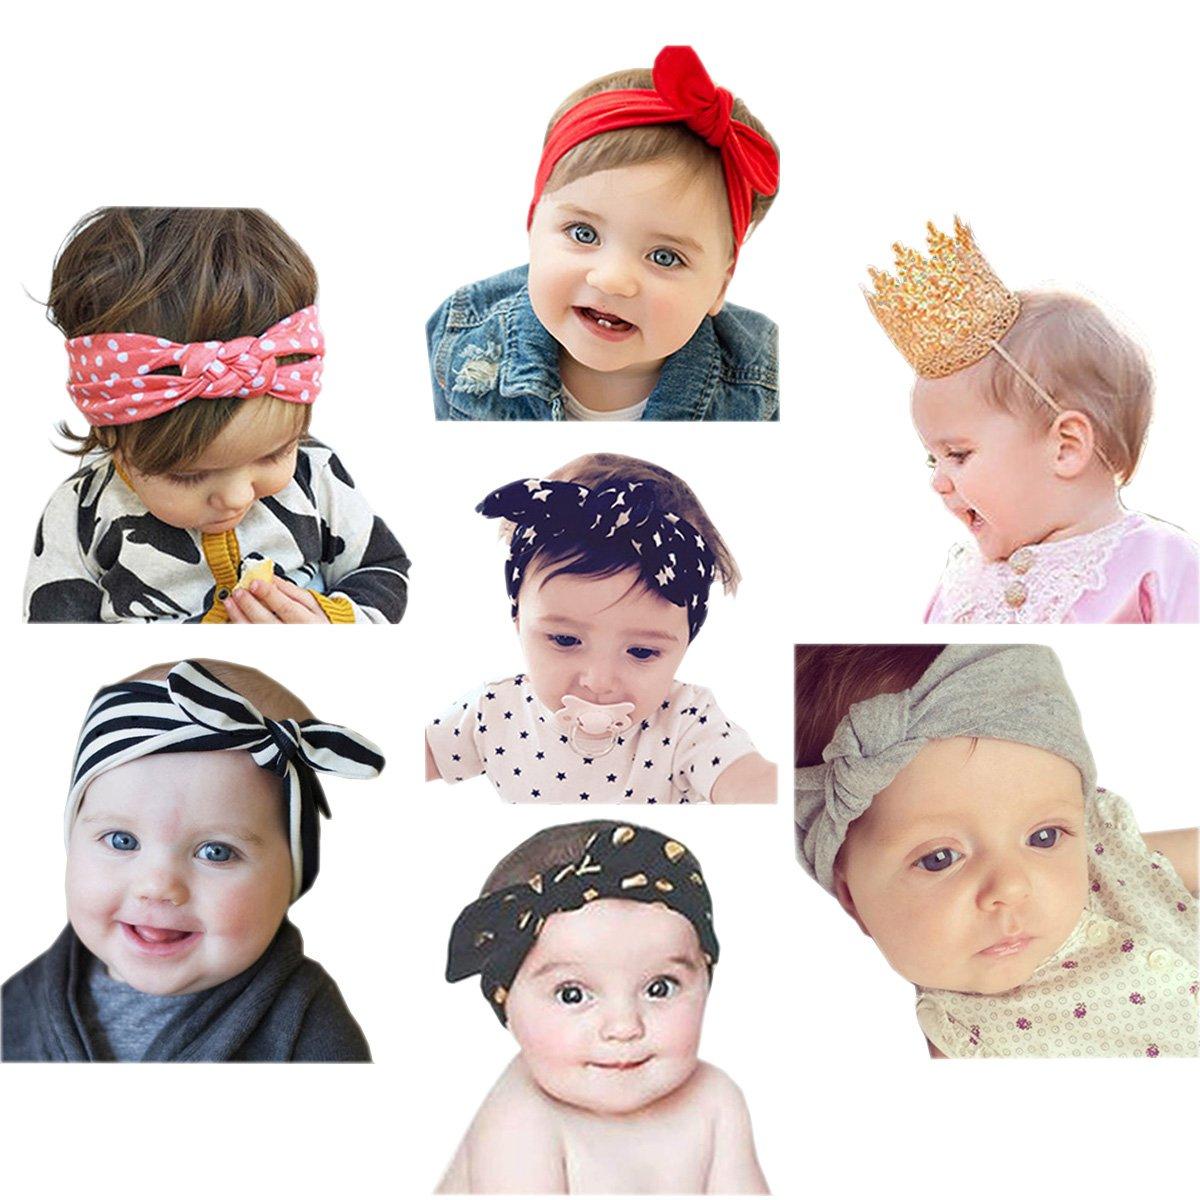 Jmitha Baby boy Crown headband Elastic Hairband hair accessories - 7  pieces  Amazon.co.uk  Clothing 60f1c478c5a